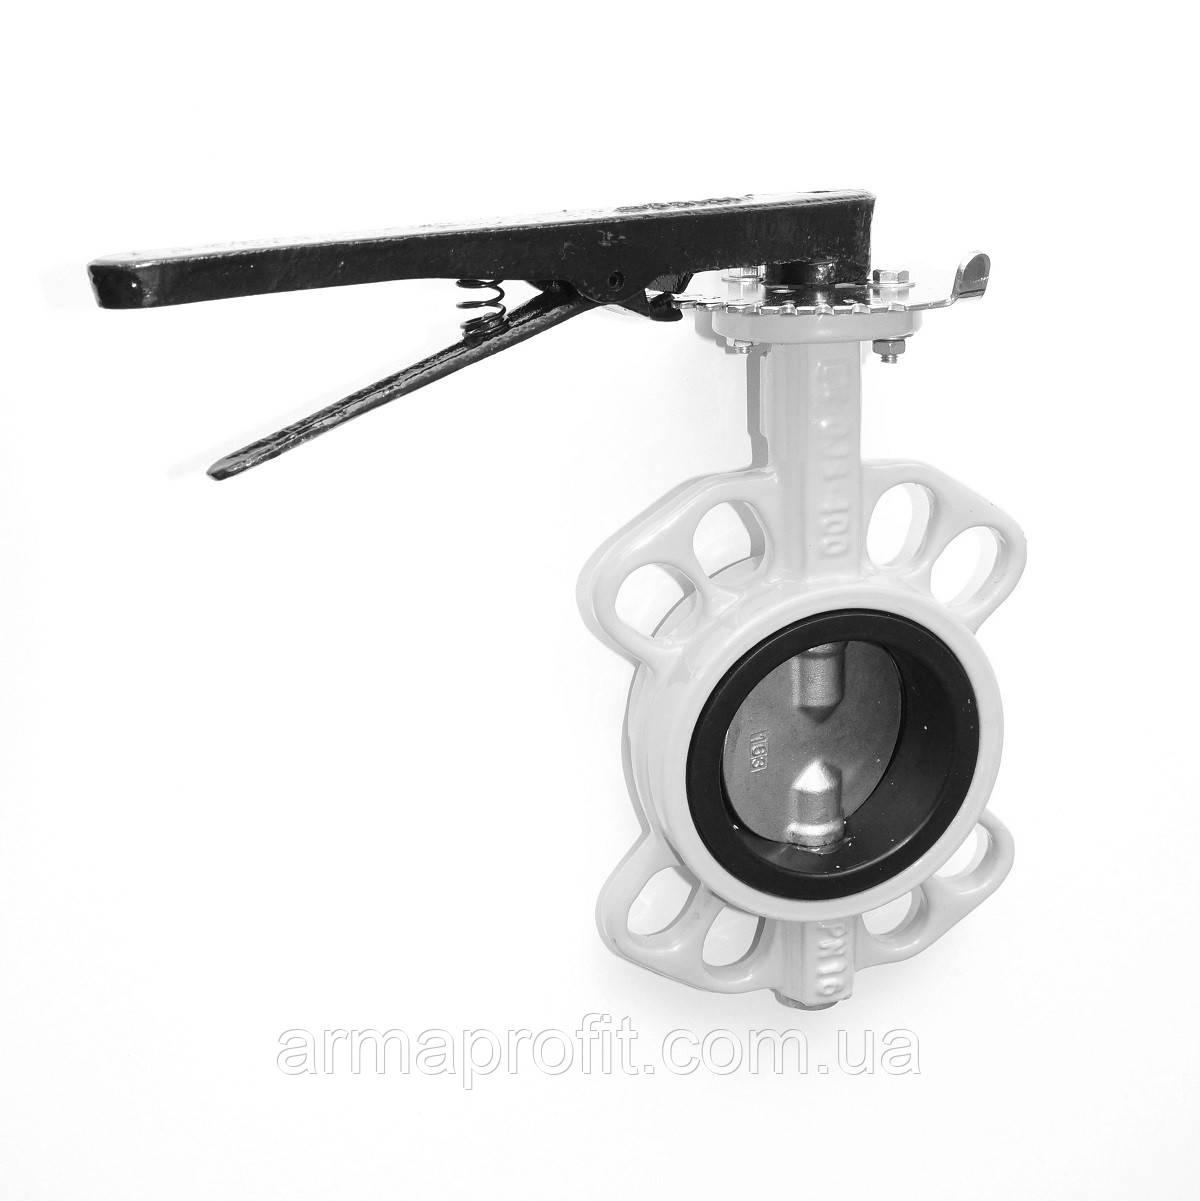 Задвижка поворотная Баттерфляй для газа RBV-16-40(G) Ду125 Ру16 (P204)